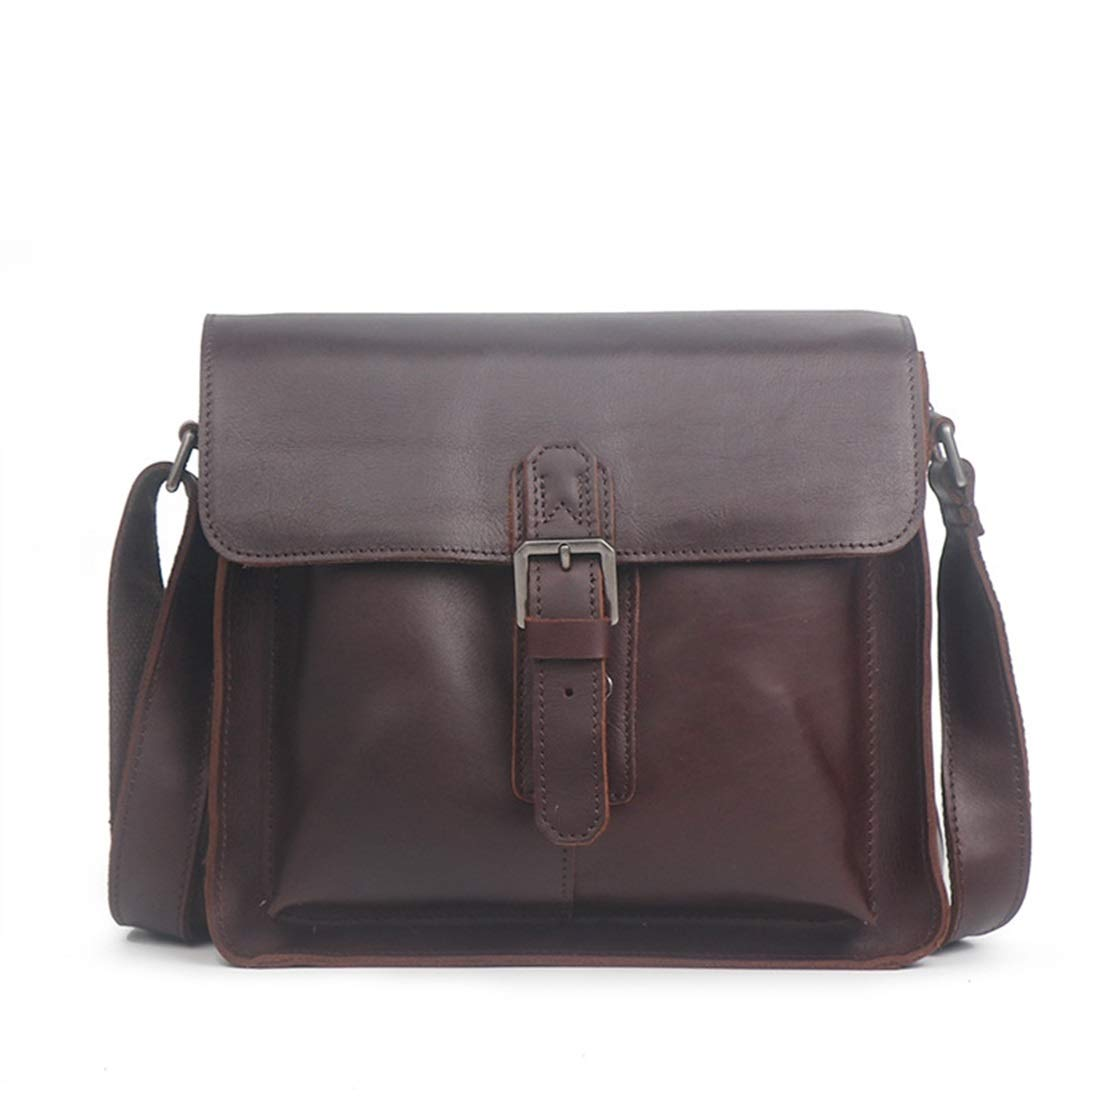 KRPENRIO Briefcase Mens Leather Chest Shoulder Crossbody Waist Bag Color : Dark Brown